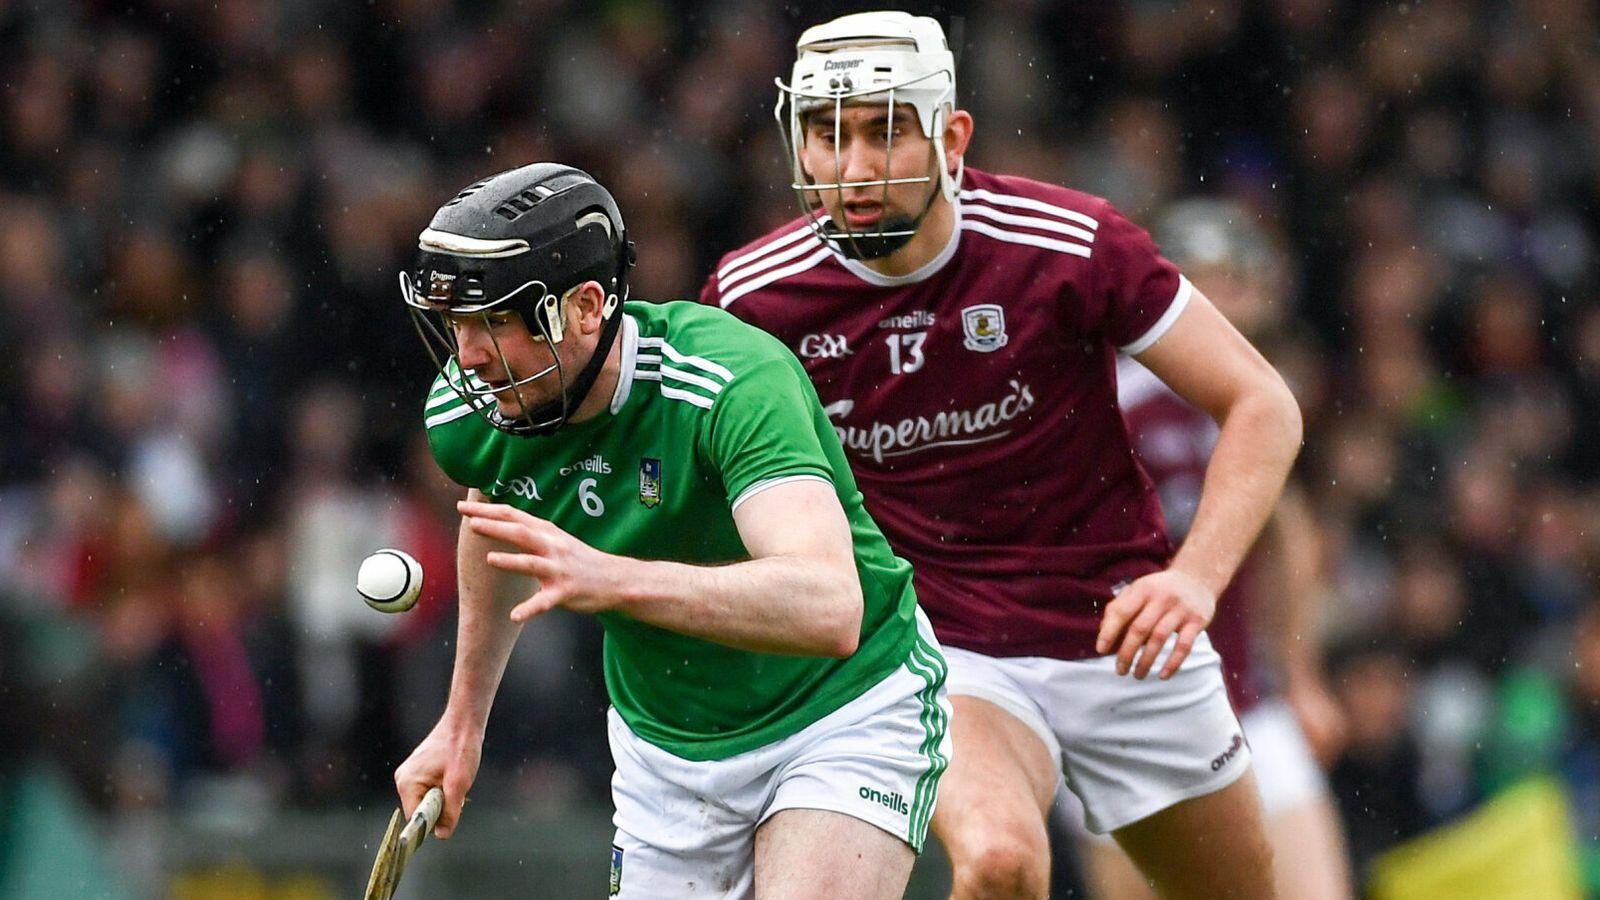 Galway club hurling betting odds binary options strategies 2021